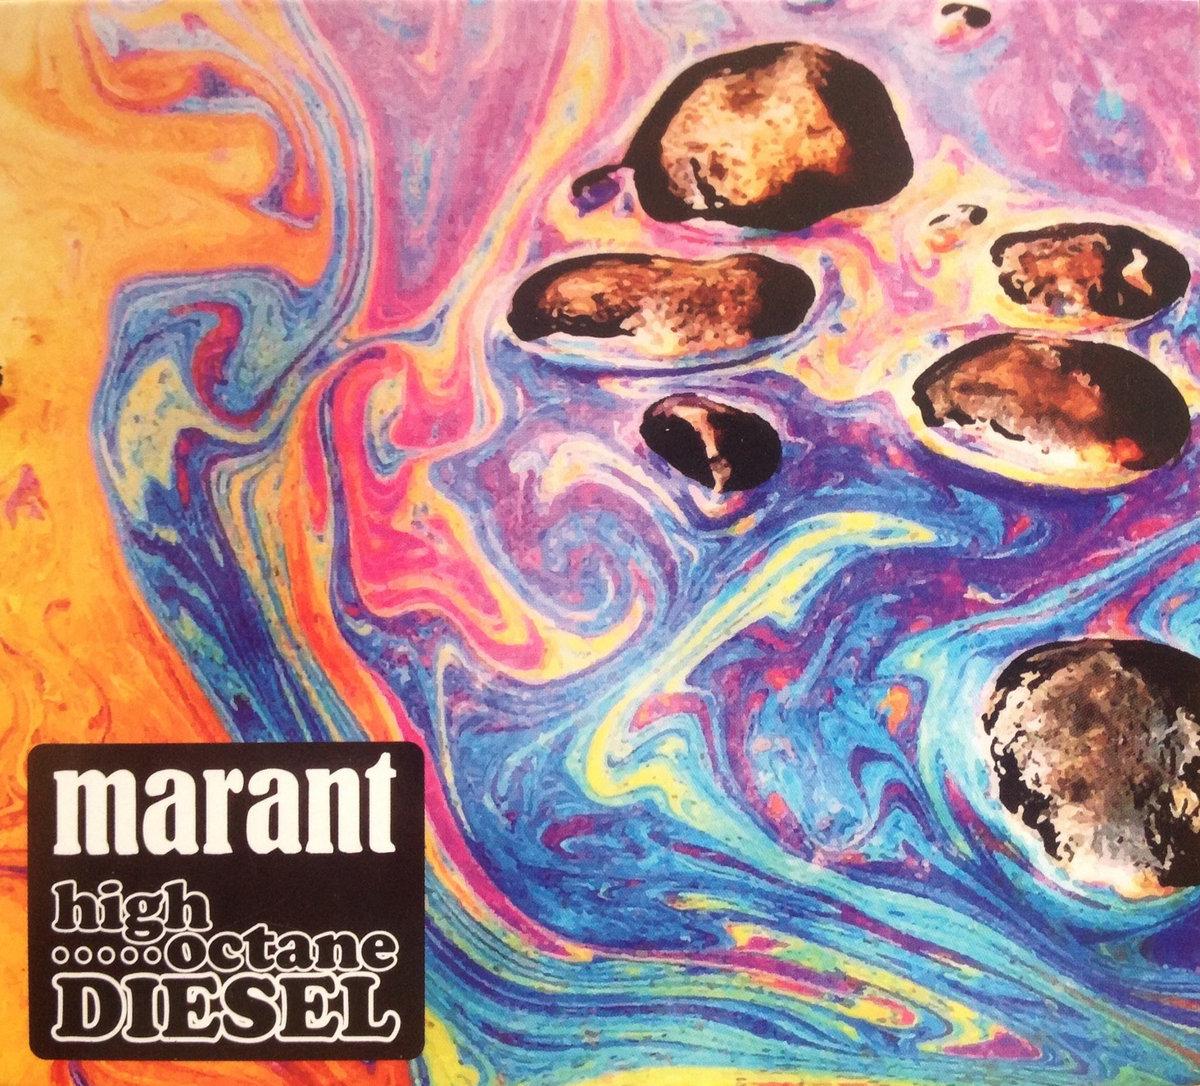 marant high octane diesel